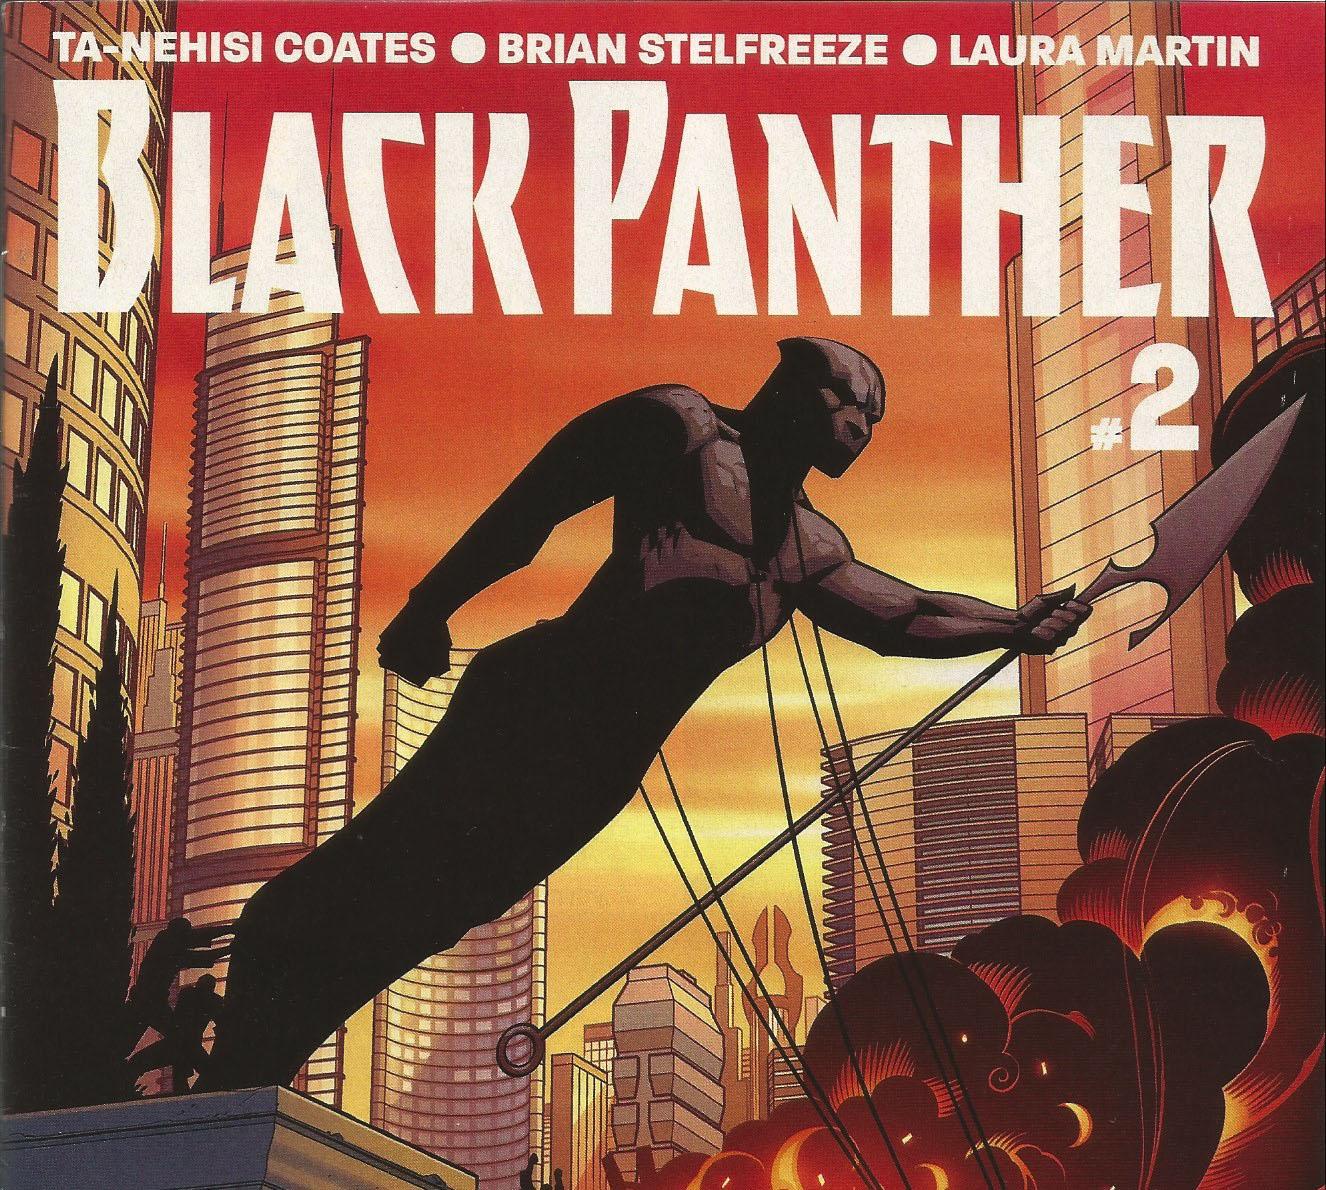 pn_mautner_blackpanther_ap_002